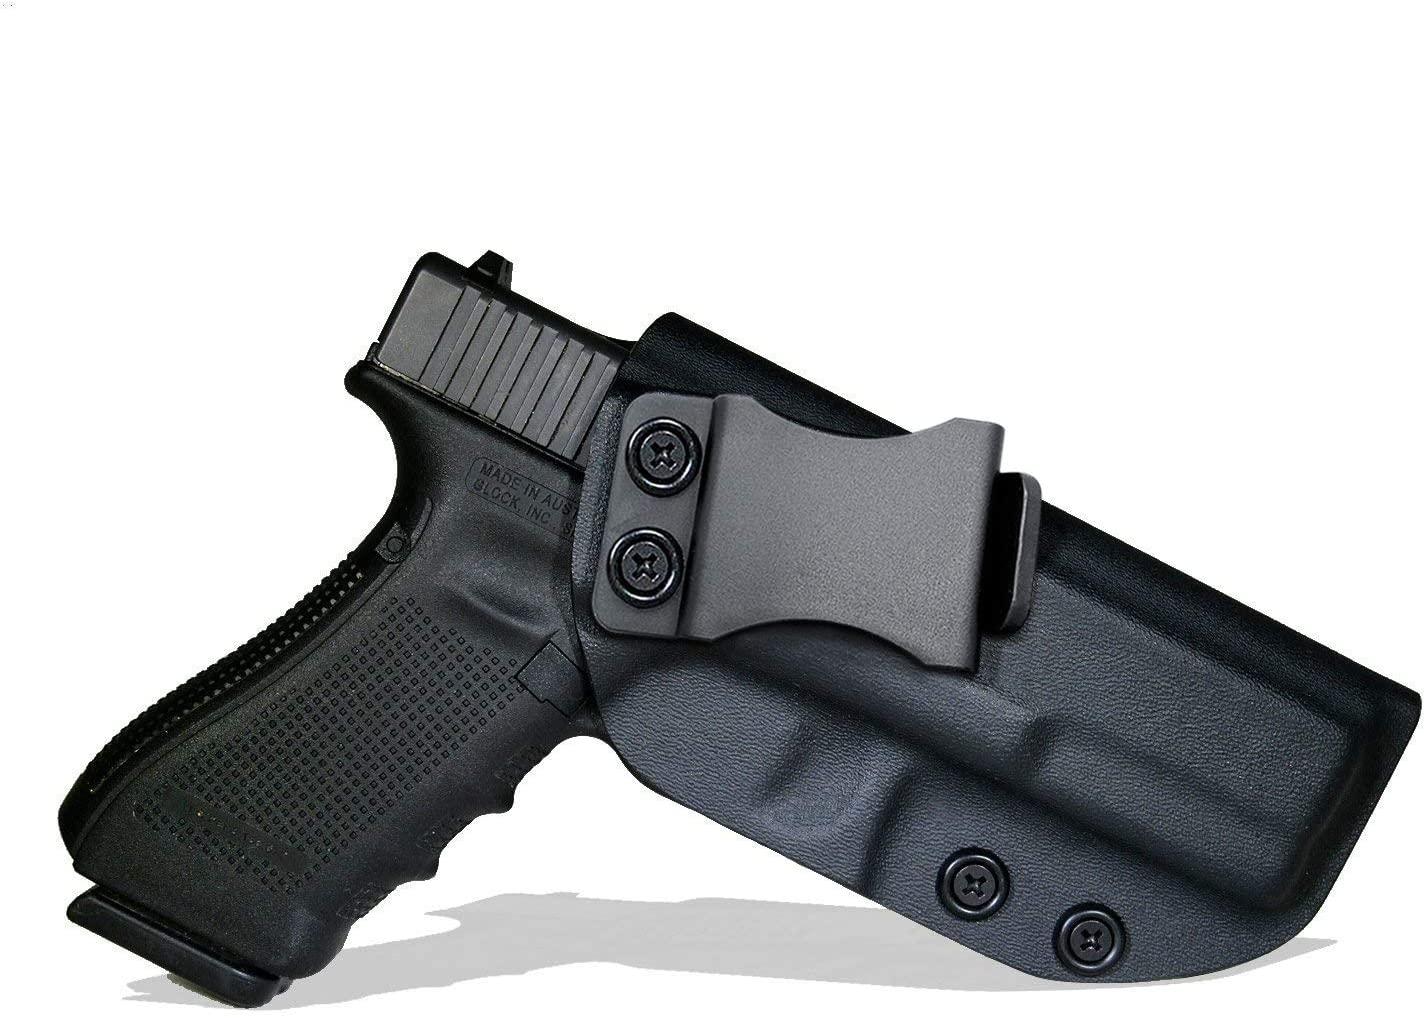 Sland Glock Holster, IWB KYDEX Holster Custom Fit: Glock 17 19 19X 22 26 27 33 43 43X (Gen 1-5)/S&W M&P Shield 2.0-9MM/.40 S&W Inside Waistband Concealed Carry Holster Adjustable Cant & Retention